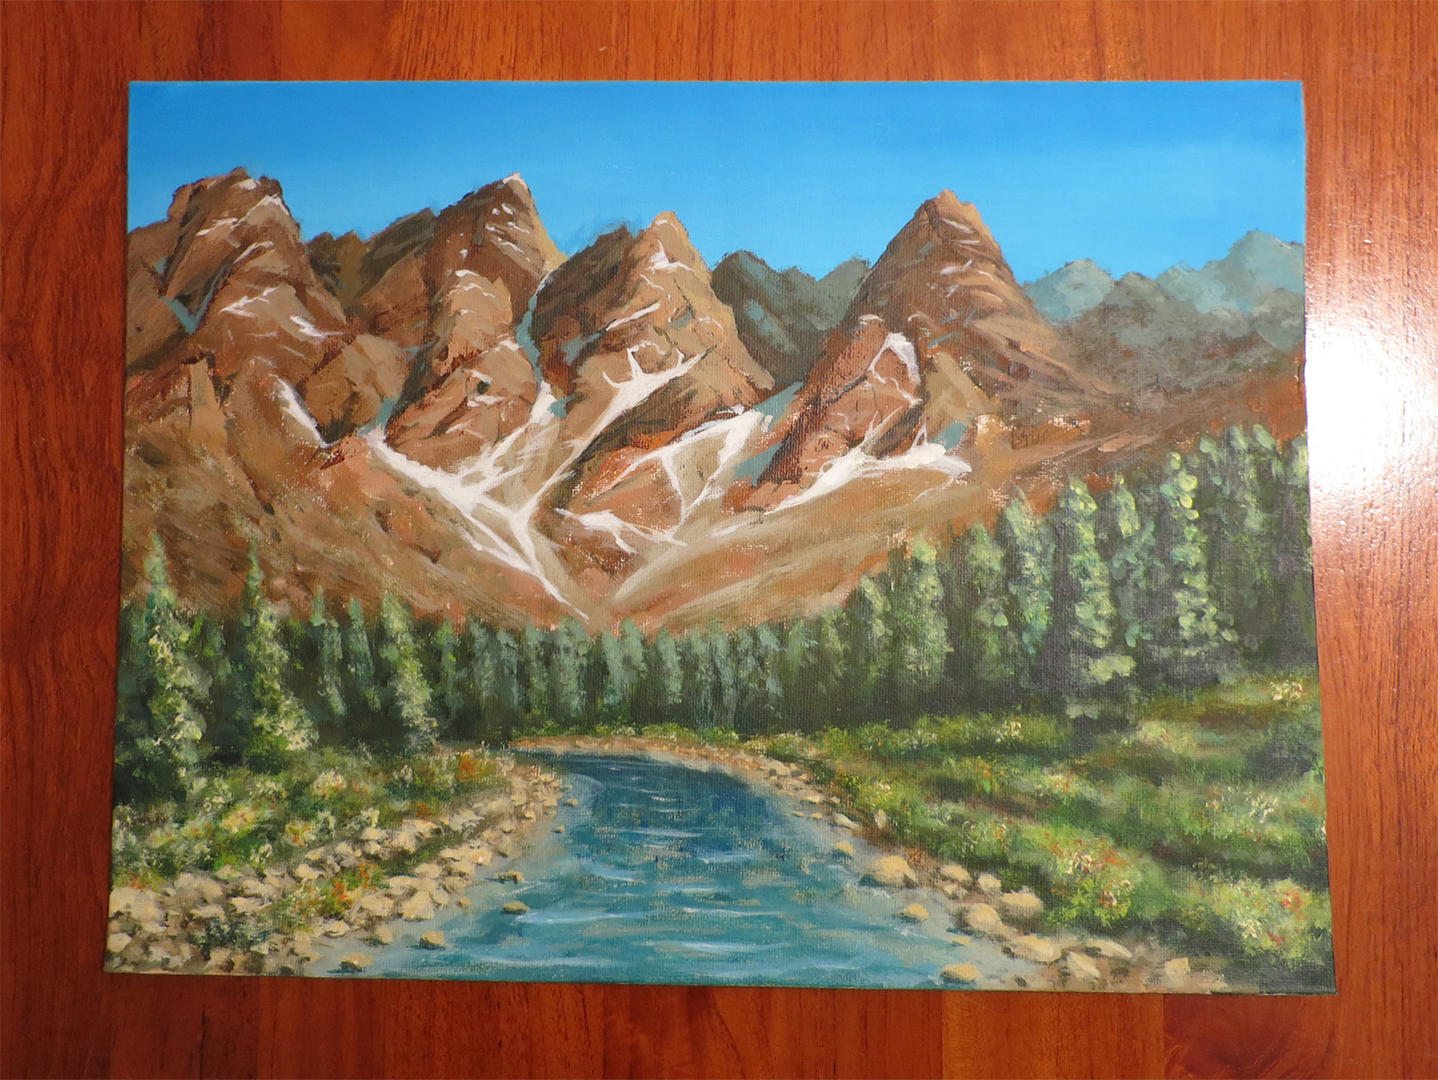 Dolomites landscape by Hupie